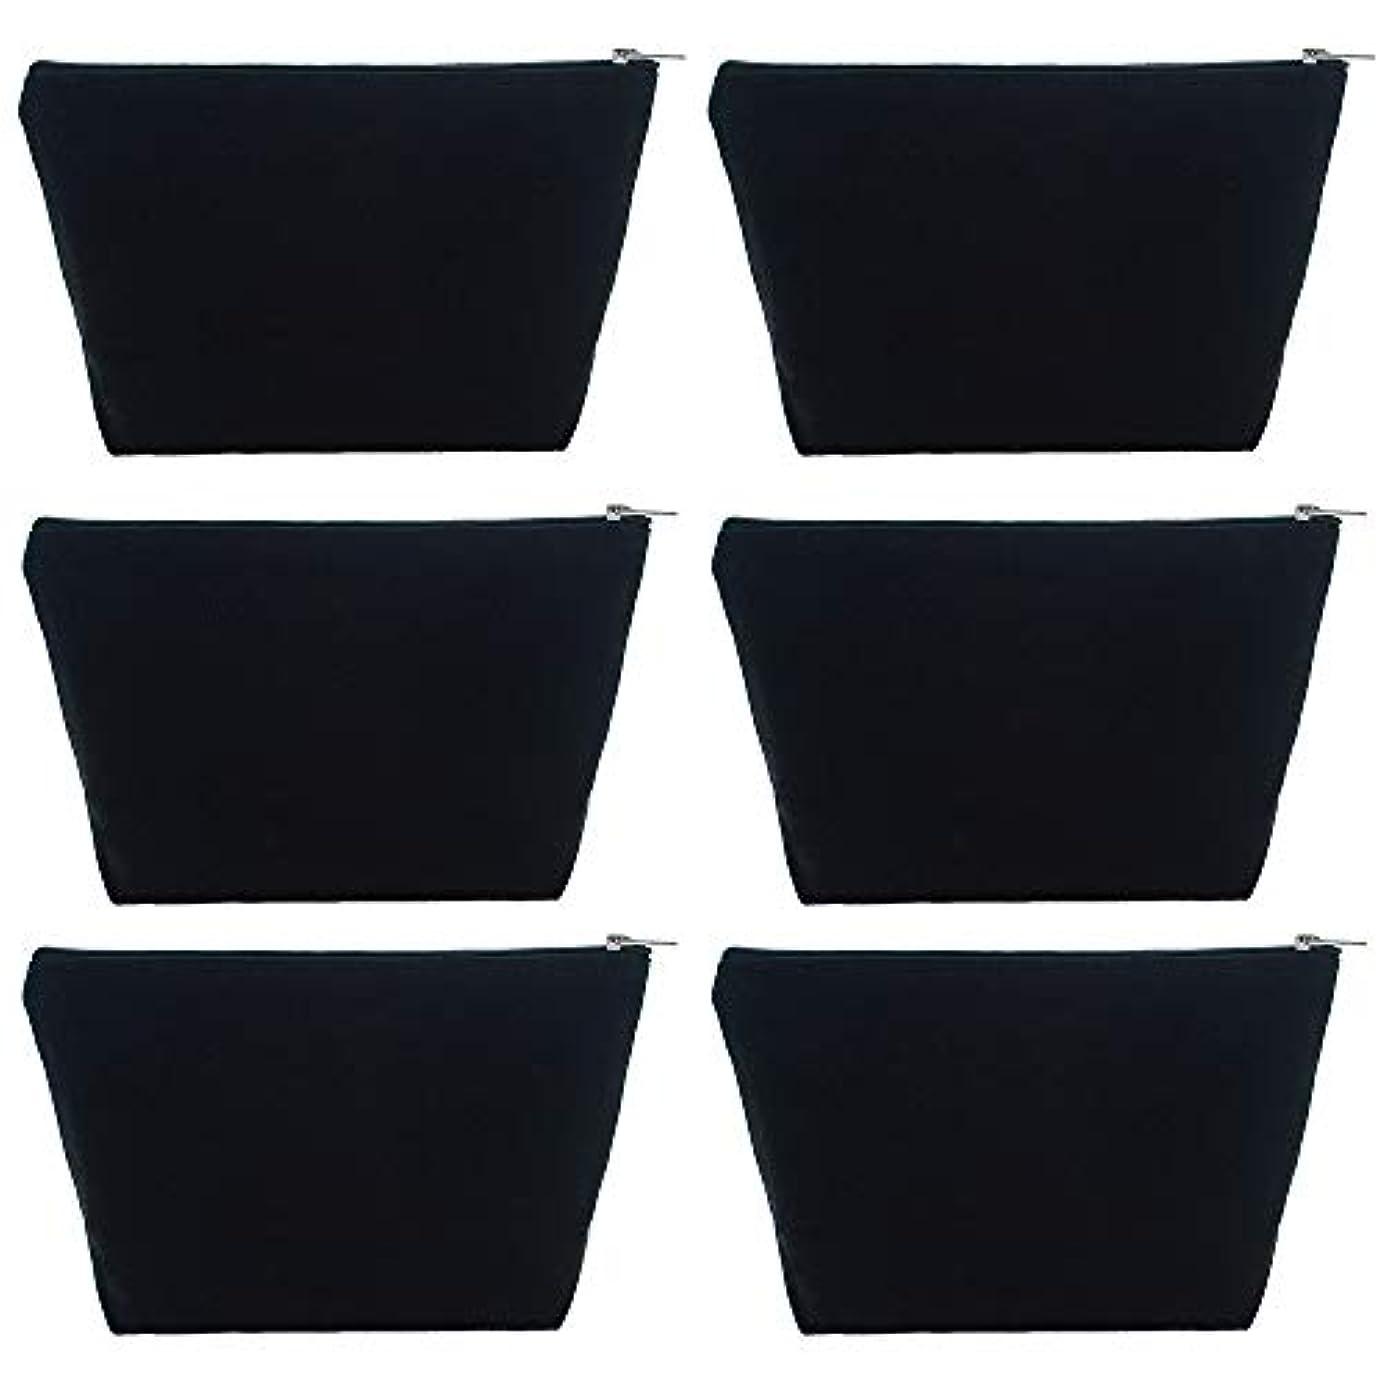 Aspire 6-Pack Cotton Canvas Zipper Bags 9.5